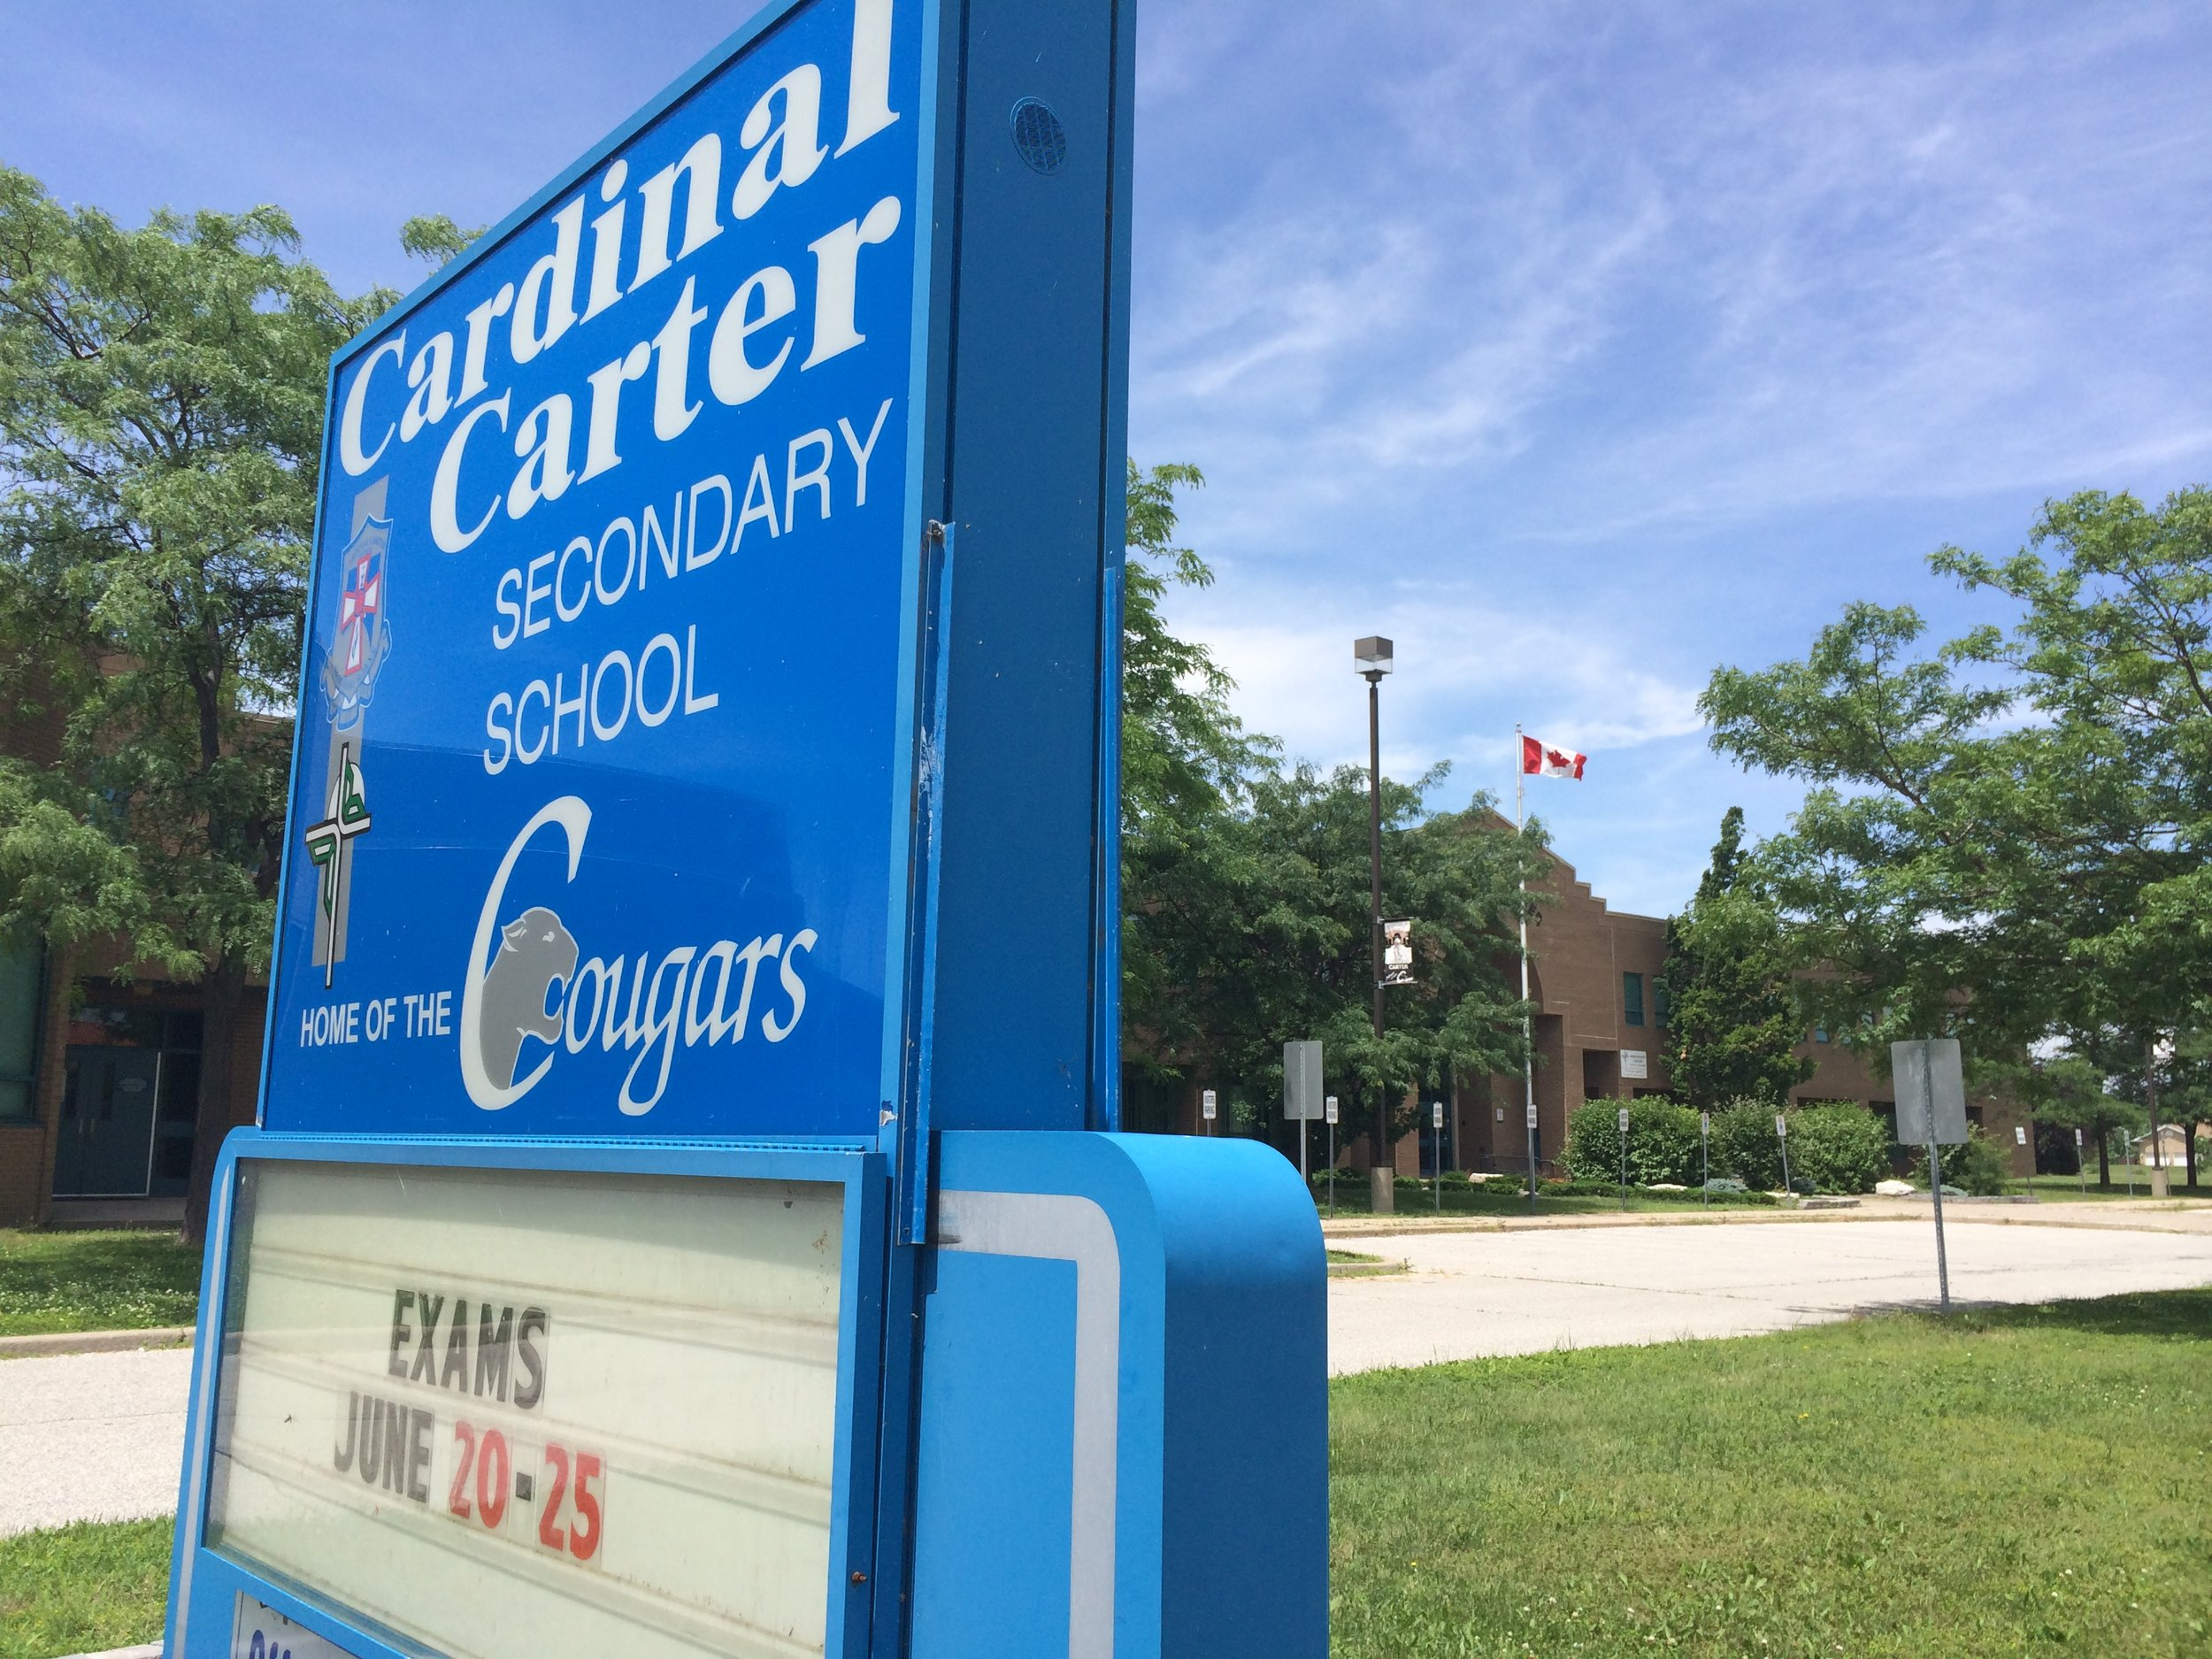 Cardinal-Carter-Catholic-Secondary-School-1.jpg